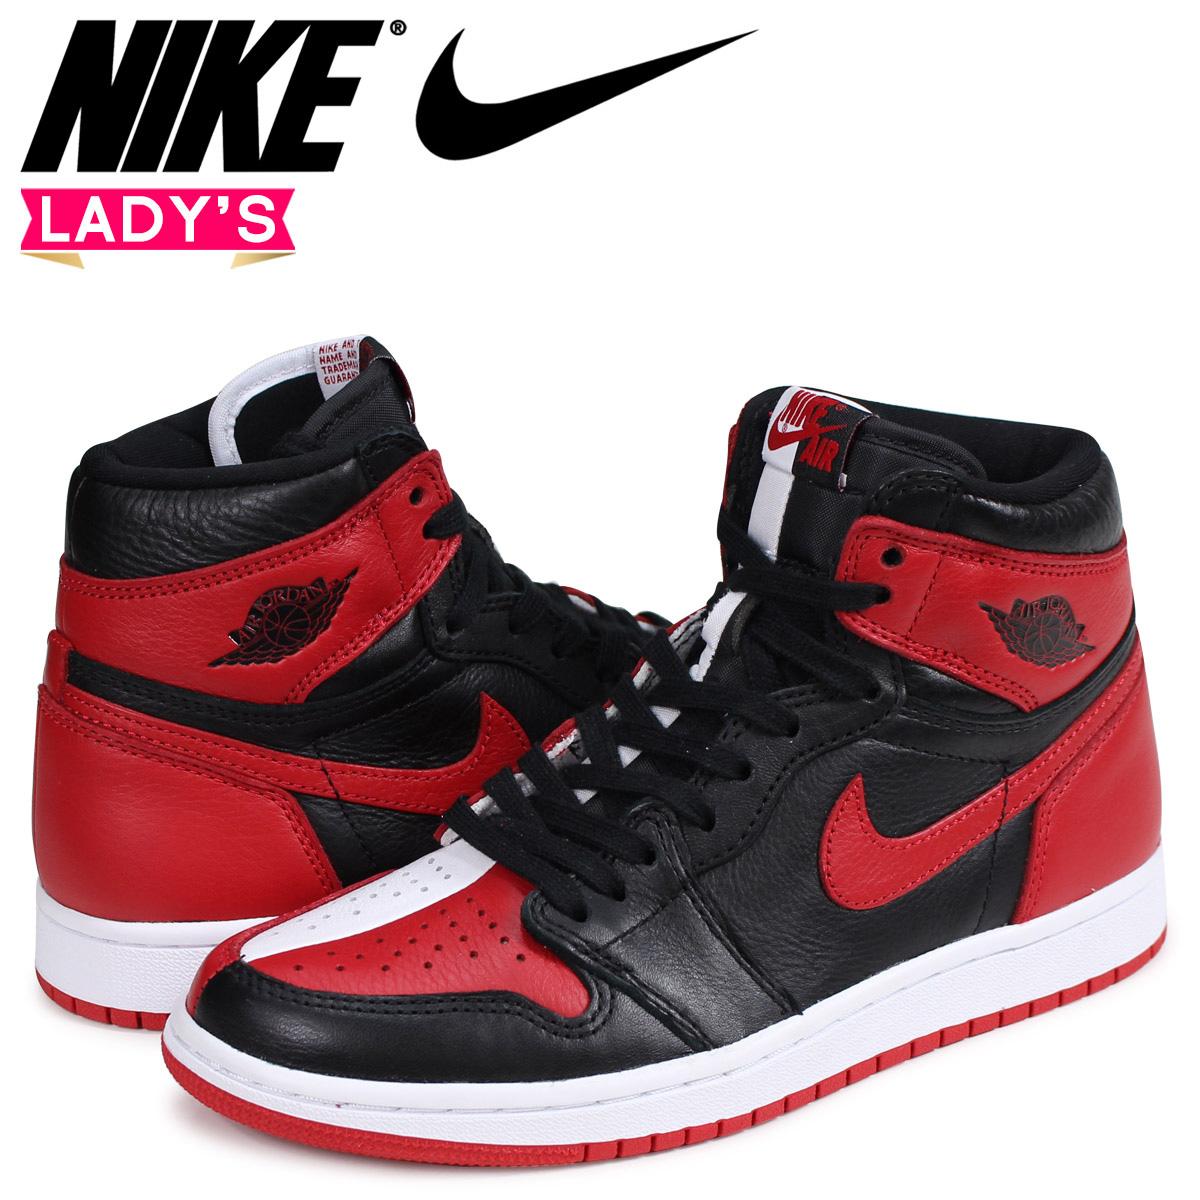 546d666009ffcb NIKE AIR JORDAN 1 RETRO HIGH OG HOMAGE TO HOME Nike Air Jordan 1 sneakers  lady s nostalgic high red 861